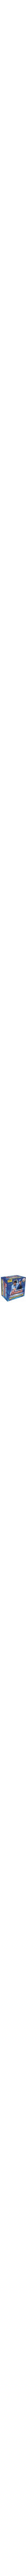 2021 Topps Bowman Baseball Sapphire Edition